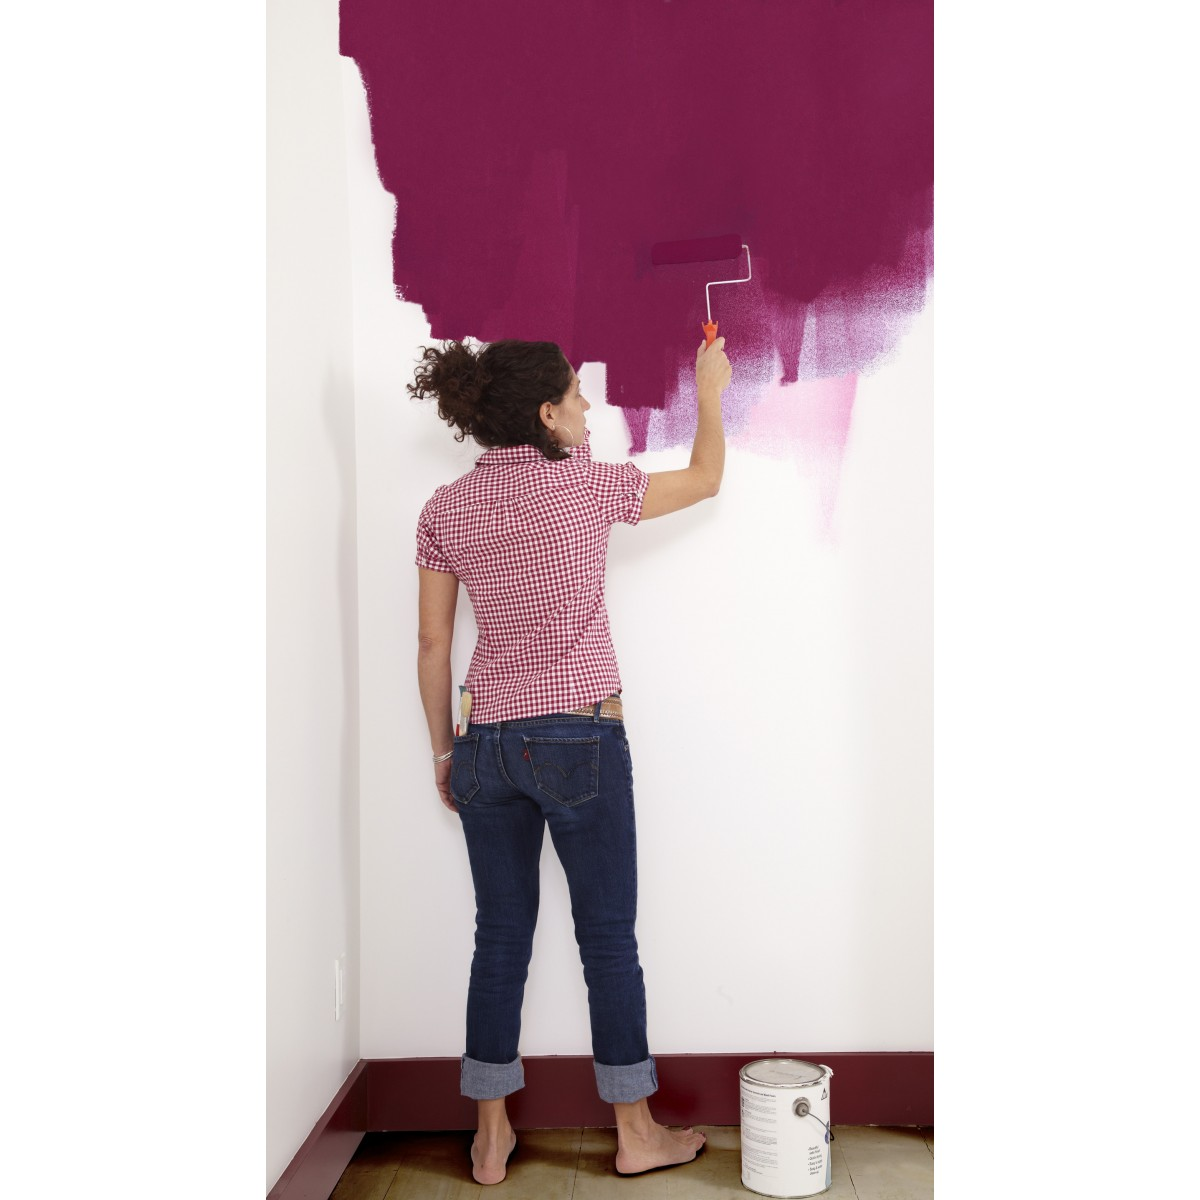 Temporary Wallpaper Design Ideas HGTV Design Blog Design 1200x1200